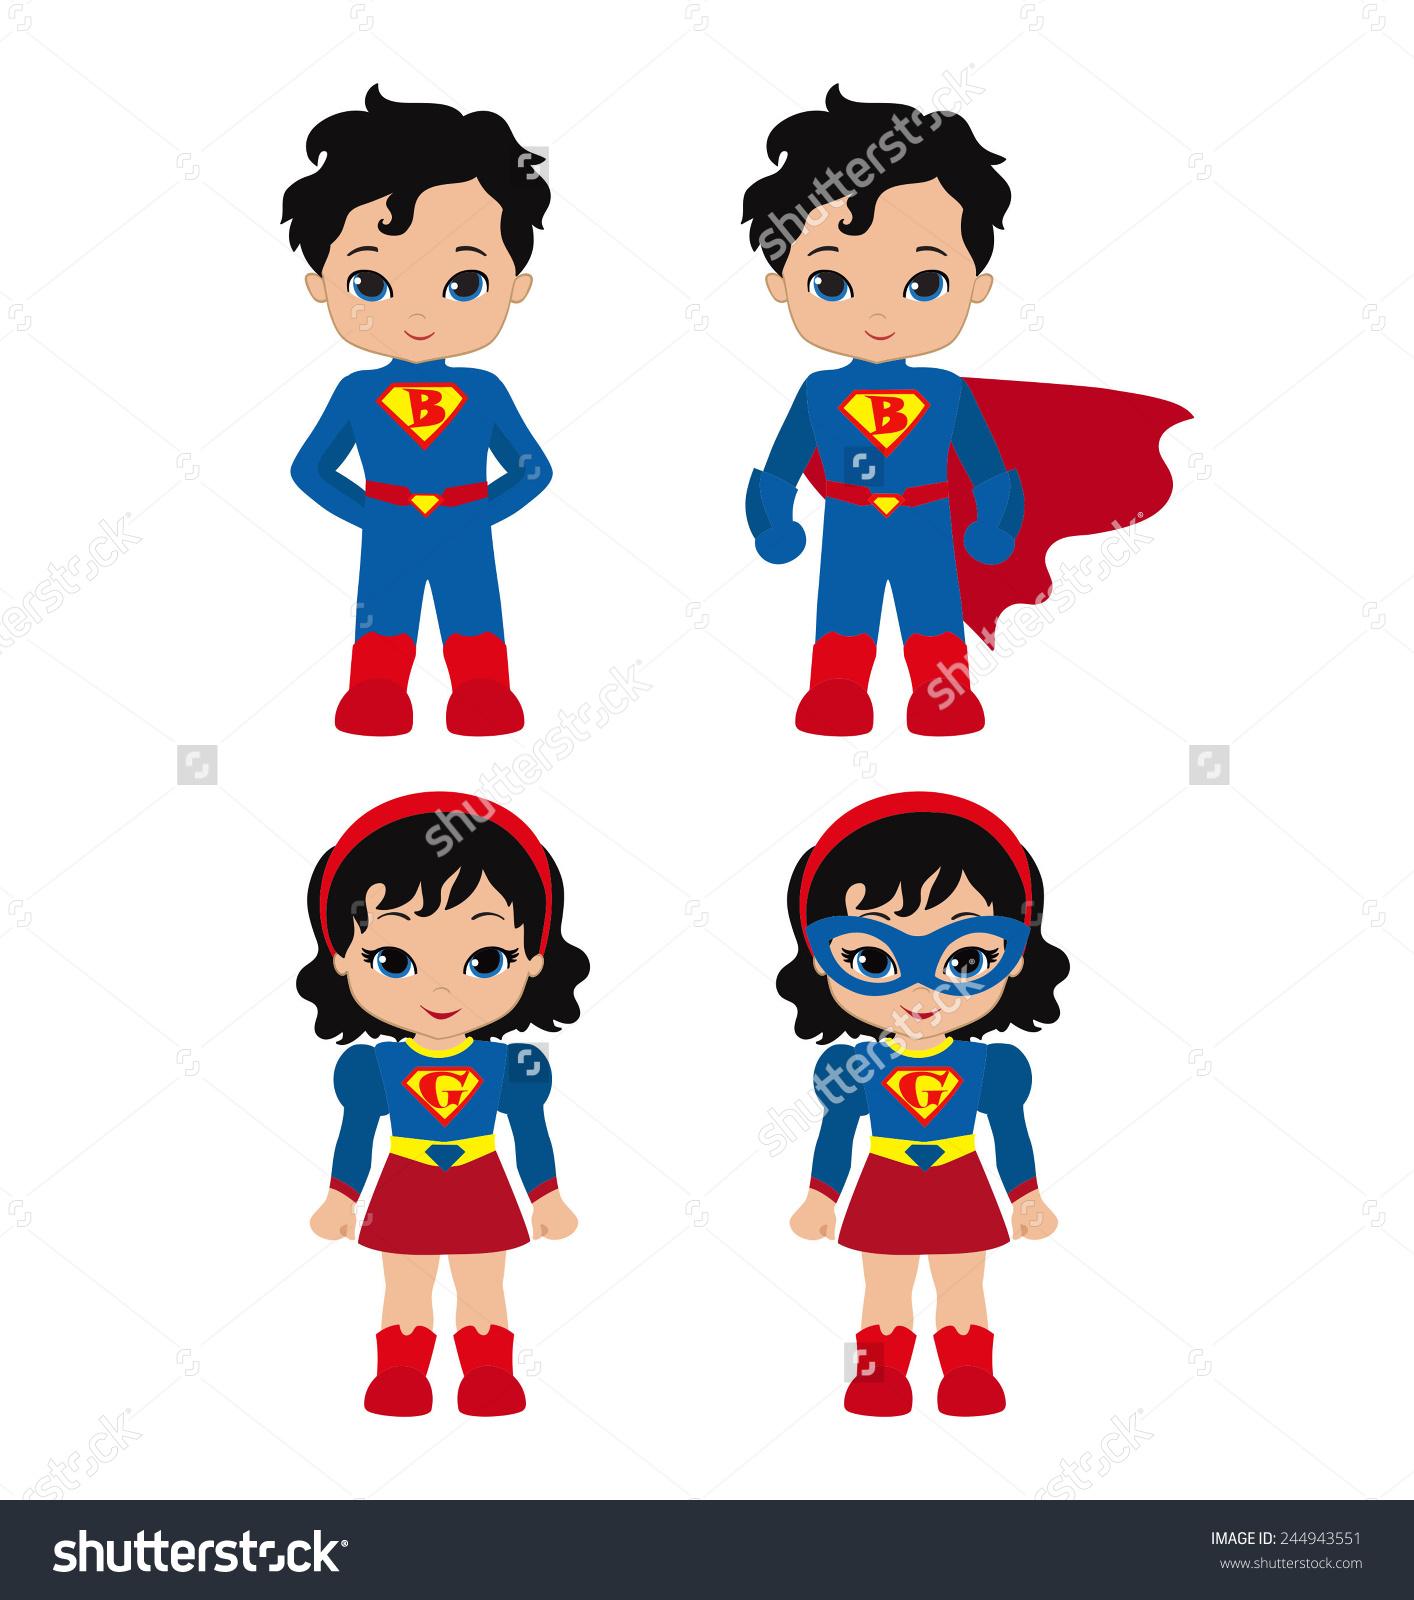 Superman kid clipart girl graphic free download Cute Superhero Girl Boy Vector Clip Stock Vector 244943551 ... graphic free download